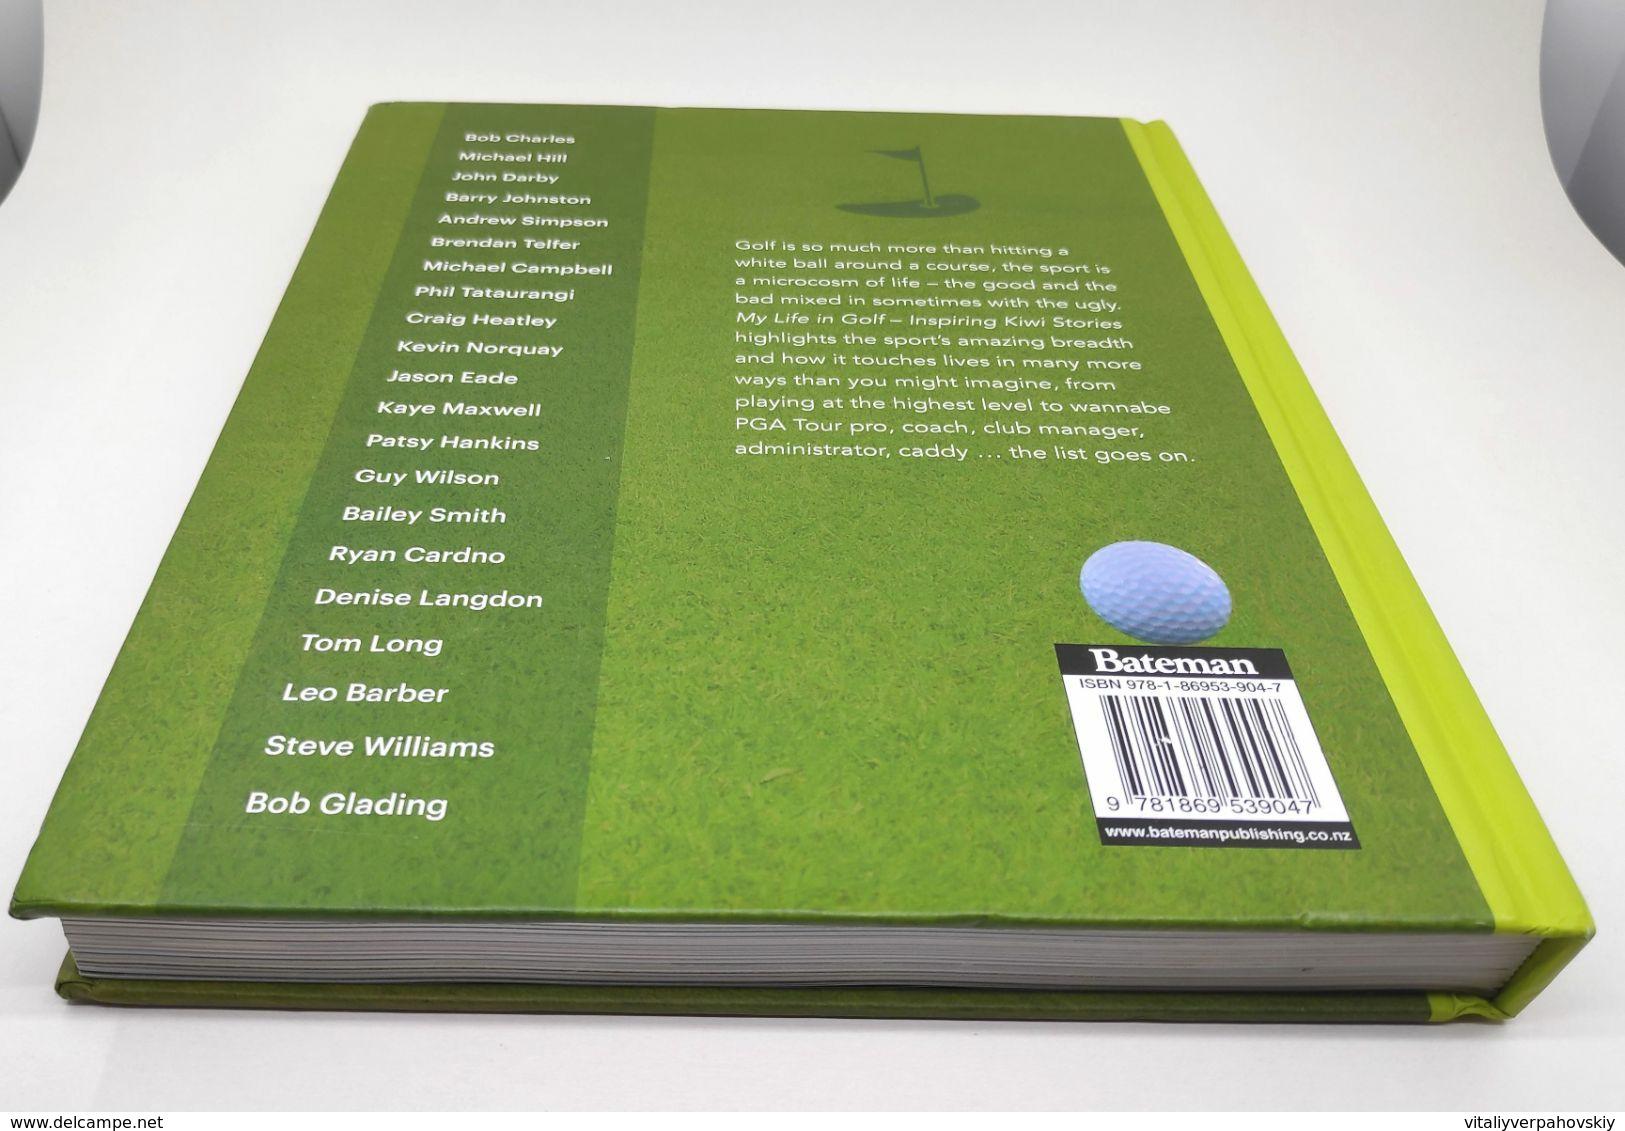 My Life In Golf - Inspiring Kiwi Stories. Heather Kidd. - 1950-Now